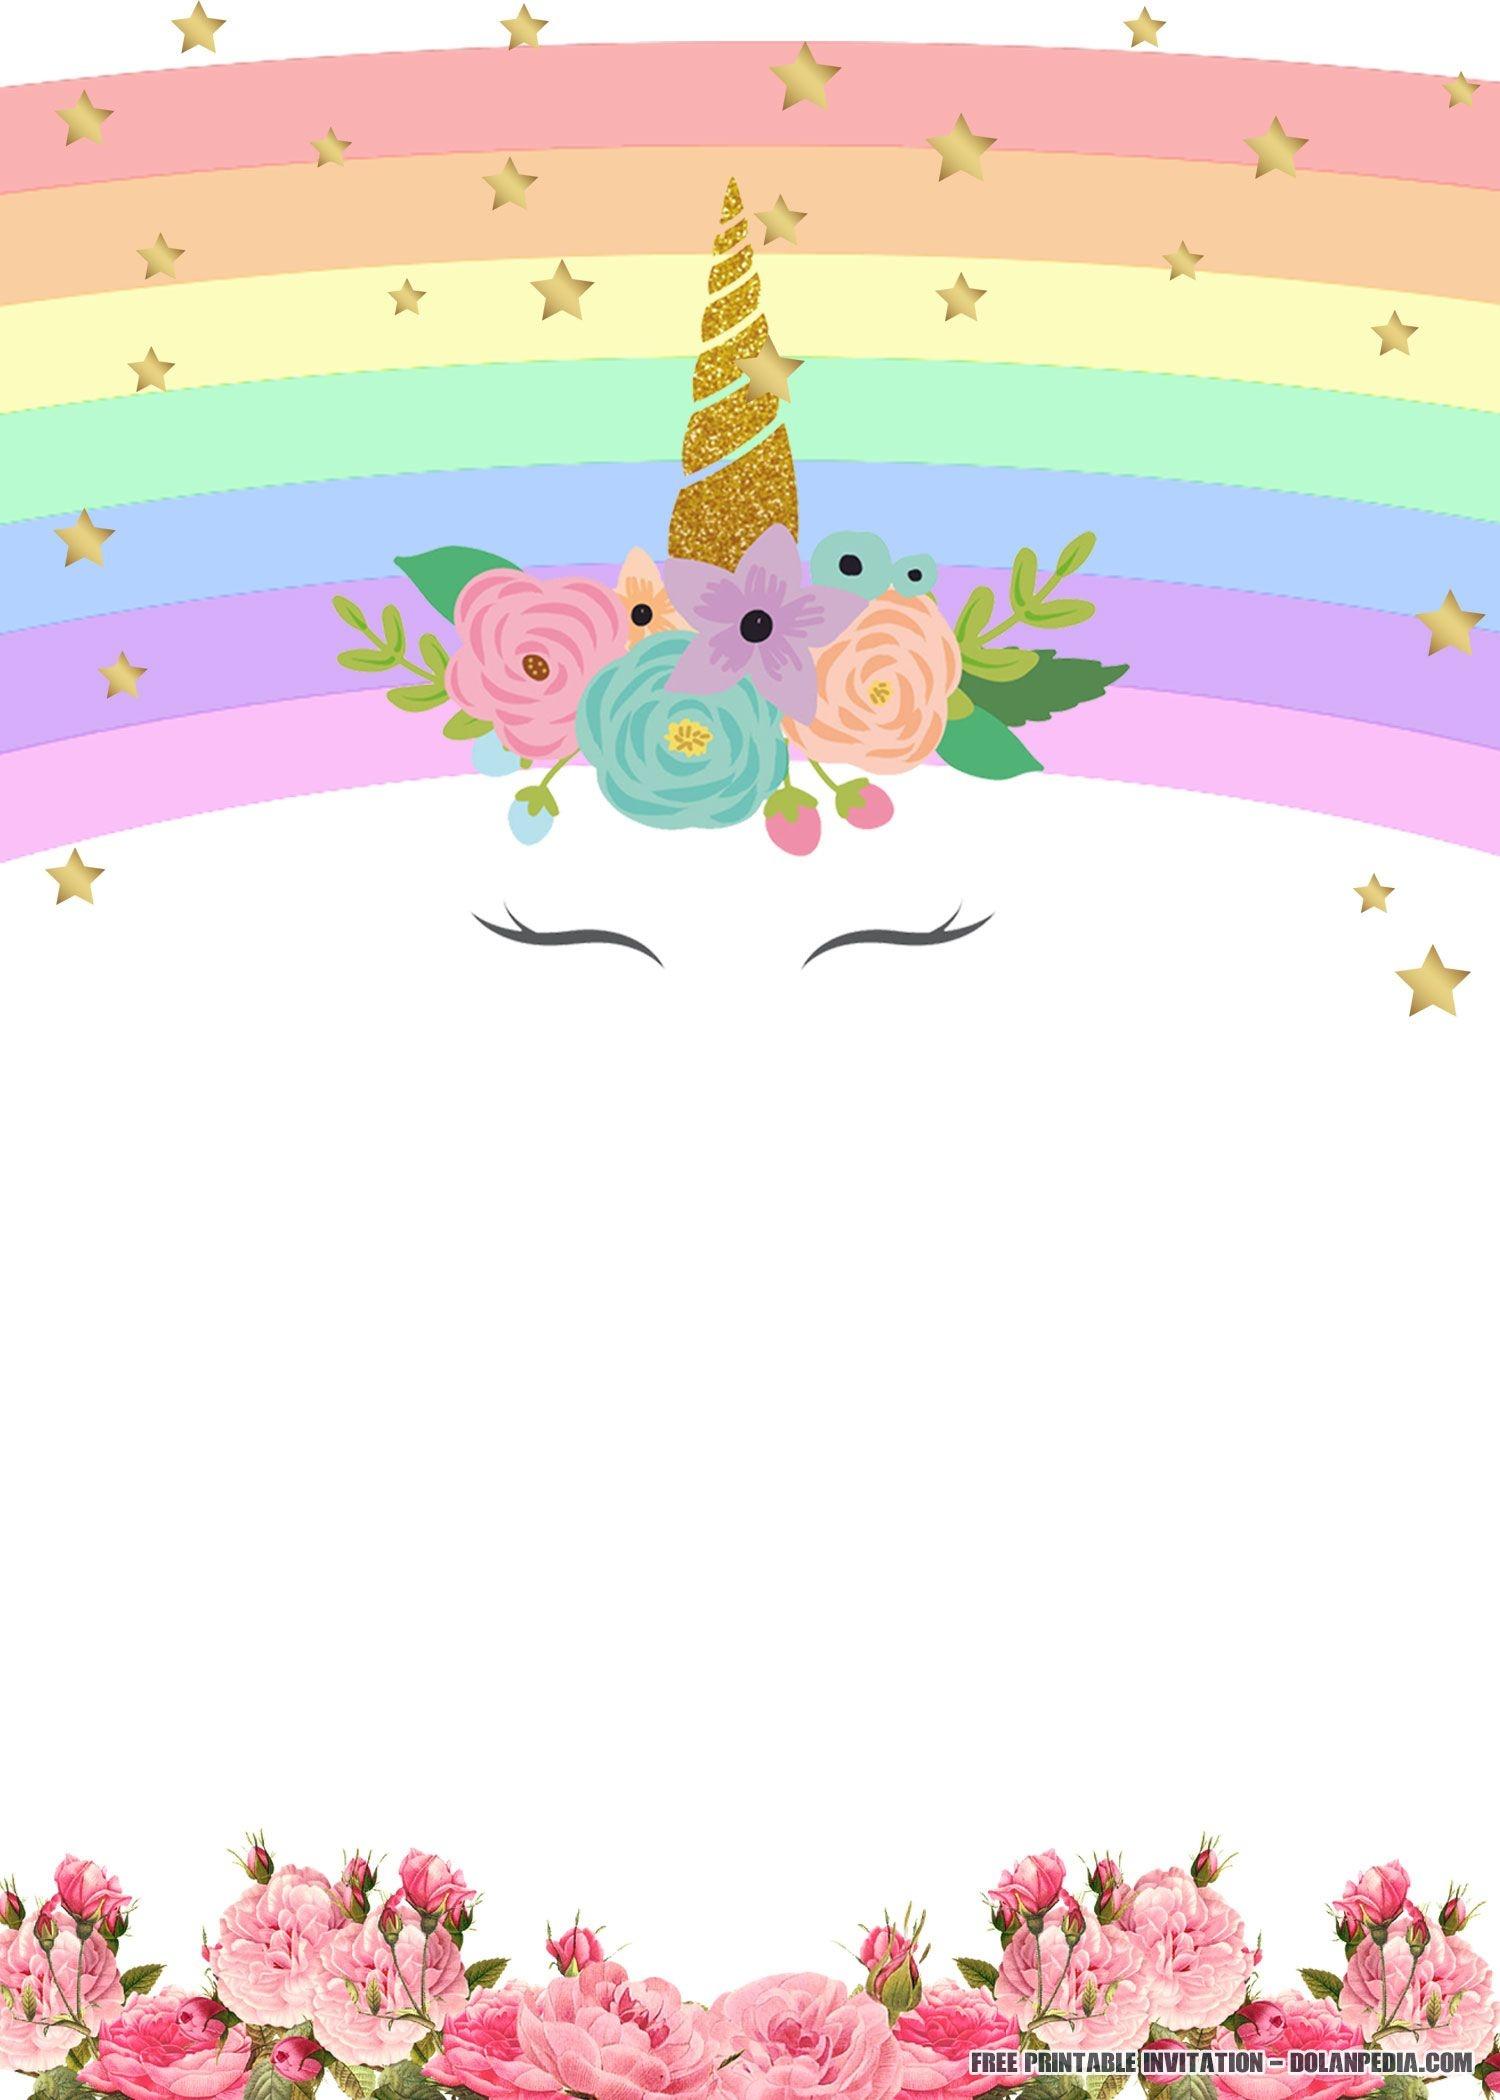 Free Printable Golden Unicorn Birthday Invitation Template   Unicorn - Free Printable Unicorn Birthday Invitations